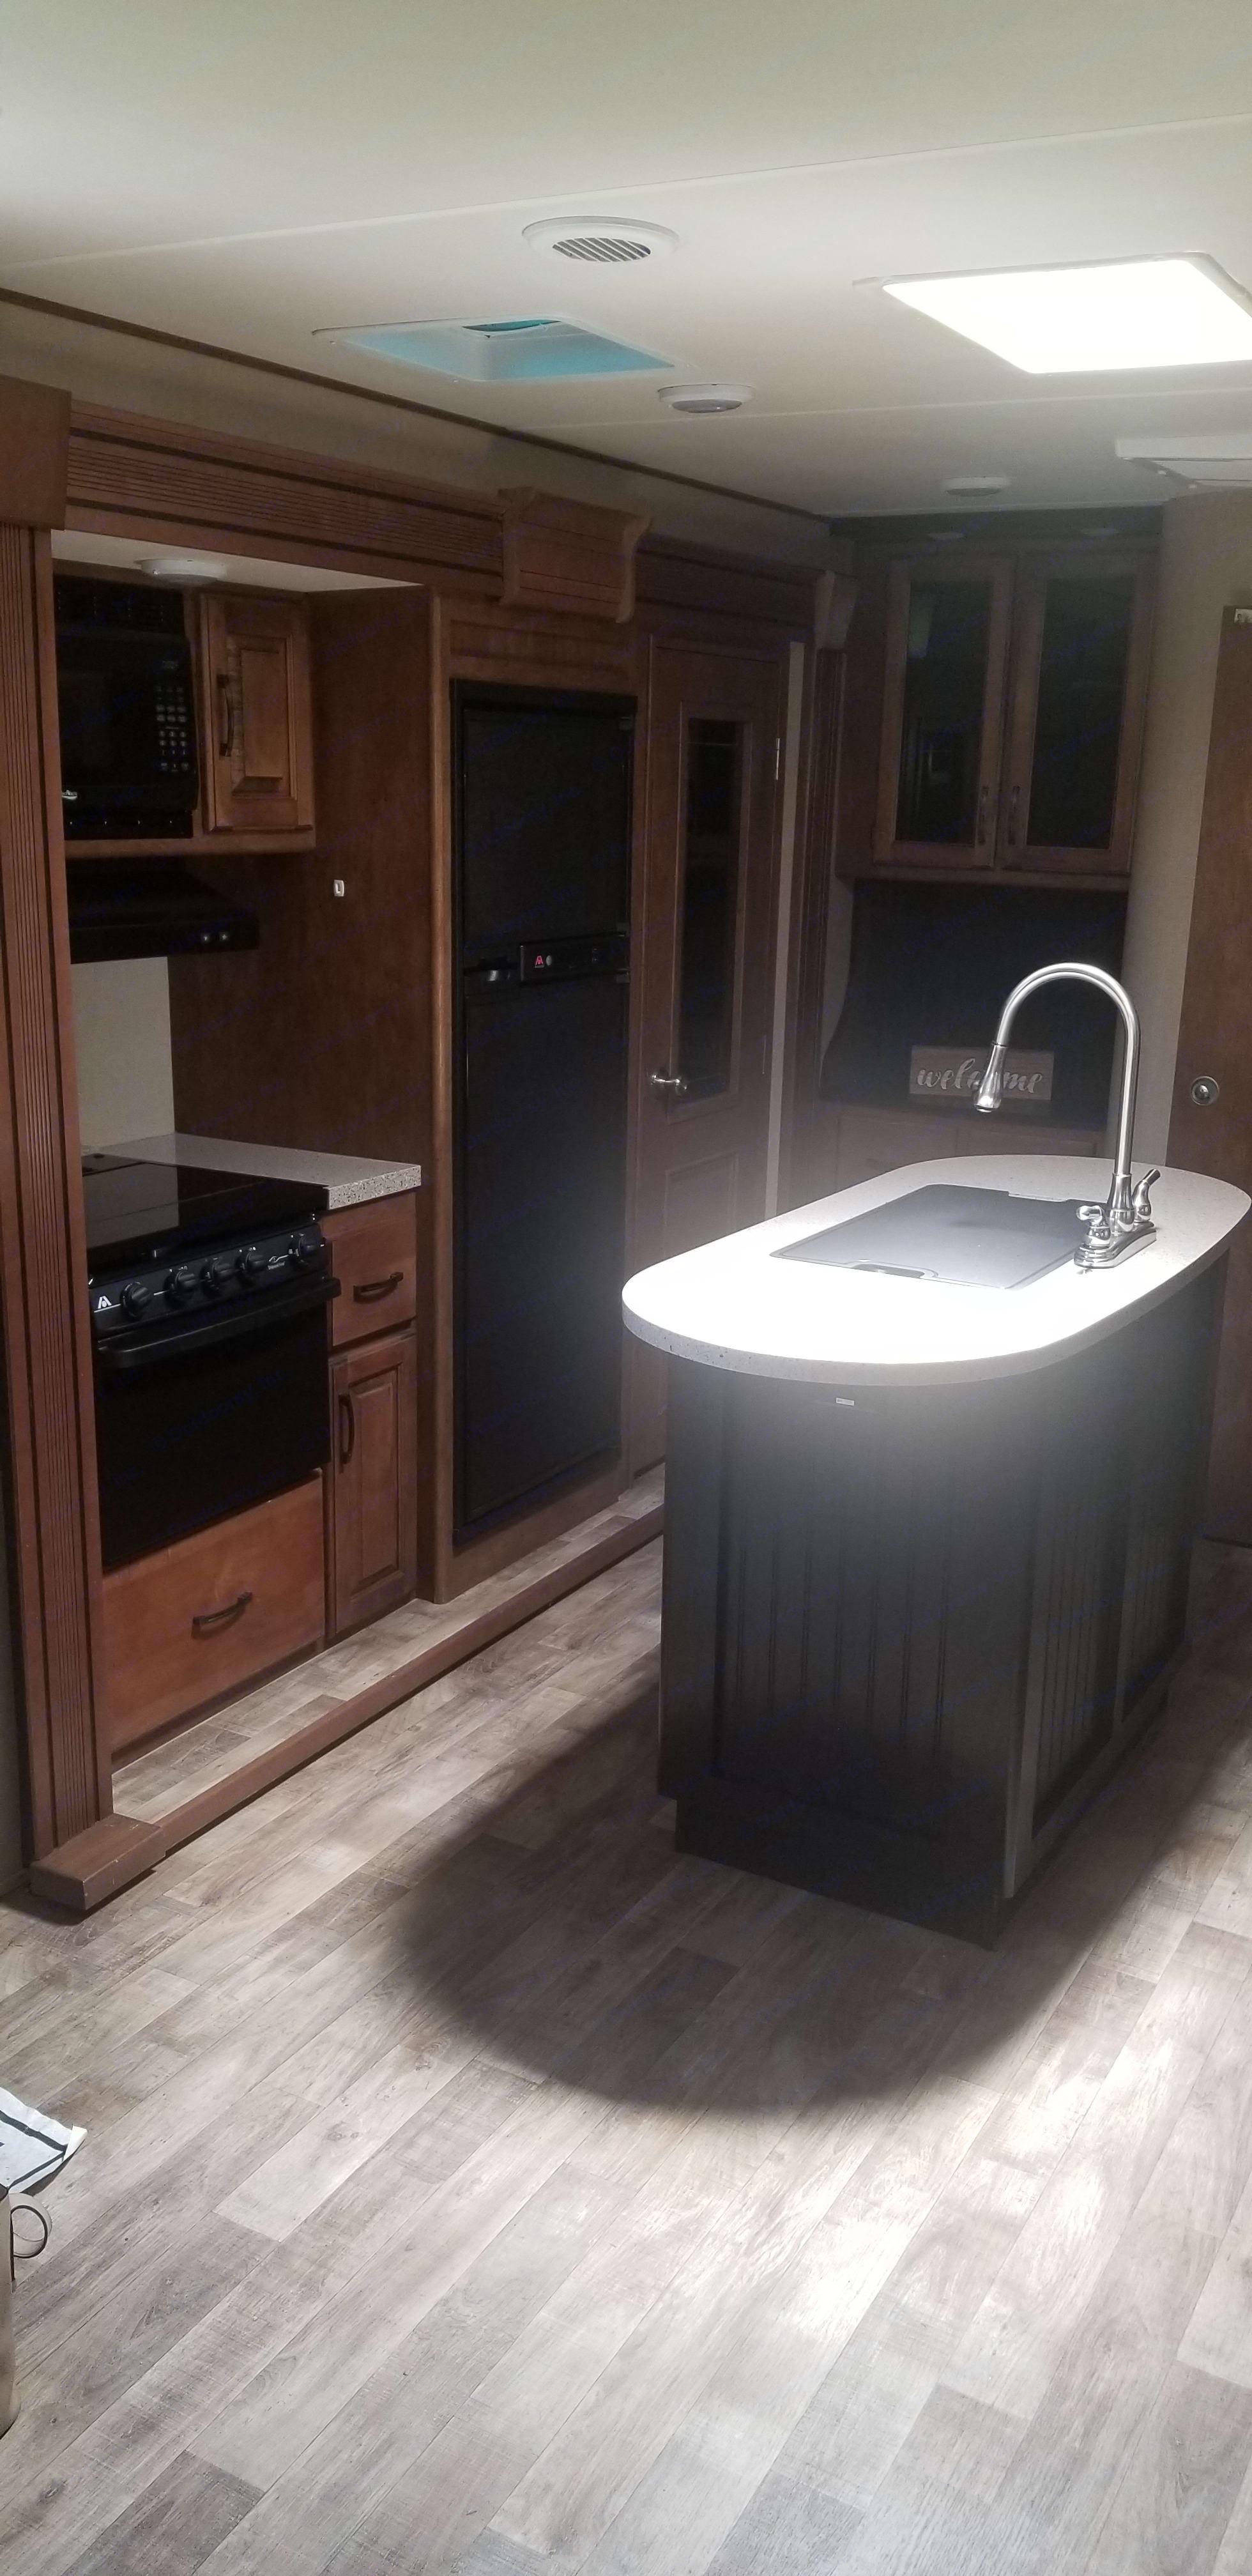 kitchen . Grand Design Reflection 2015